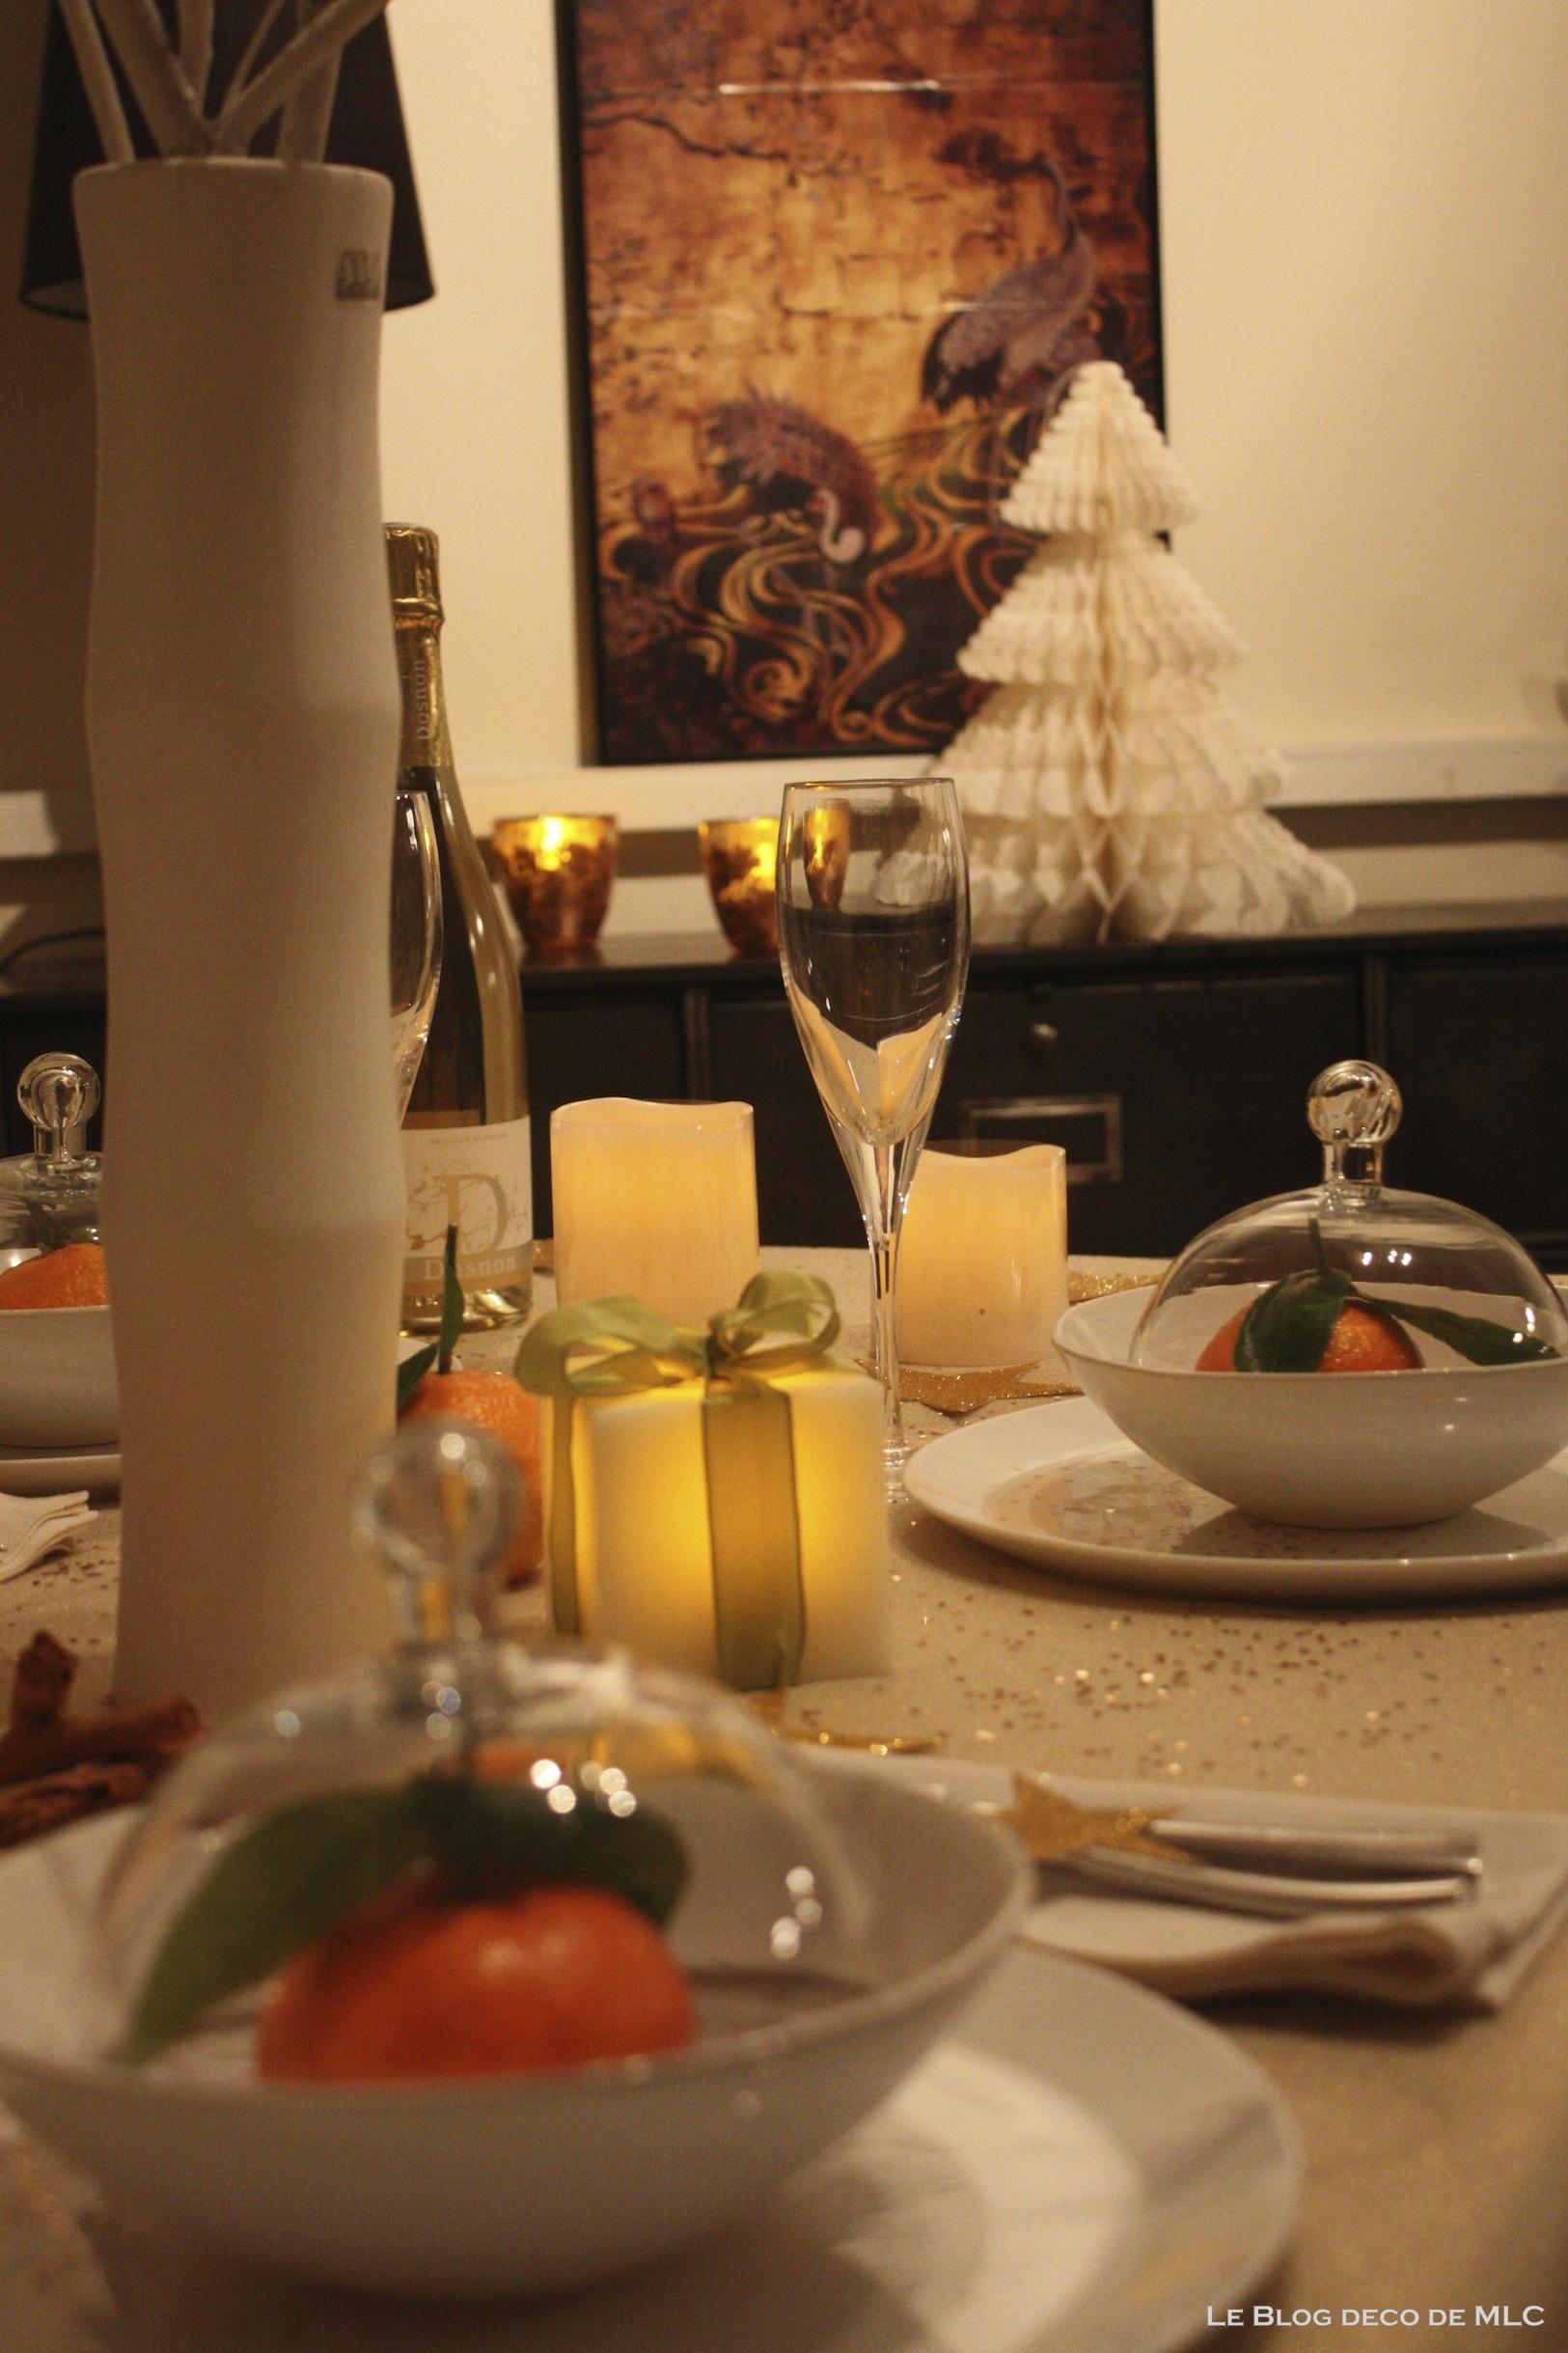 #B98412 Decoration Table De Noel 6155 decoration de table de noel 2014 1625x2438 px @ aertt.com